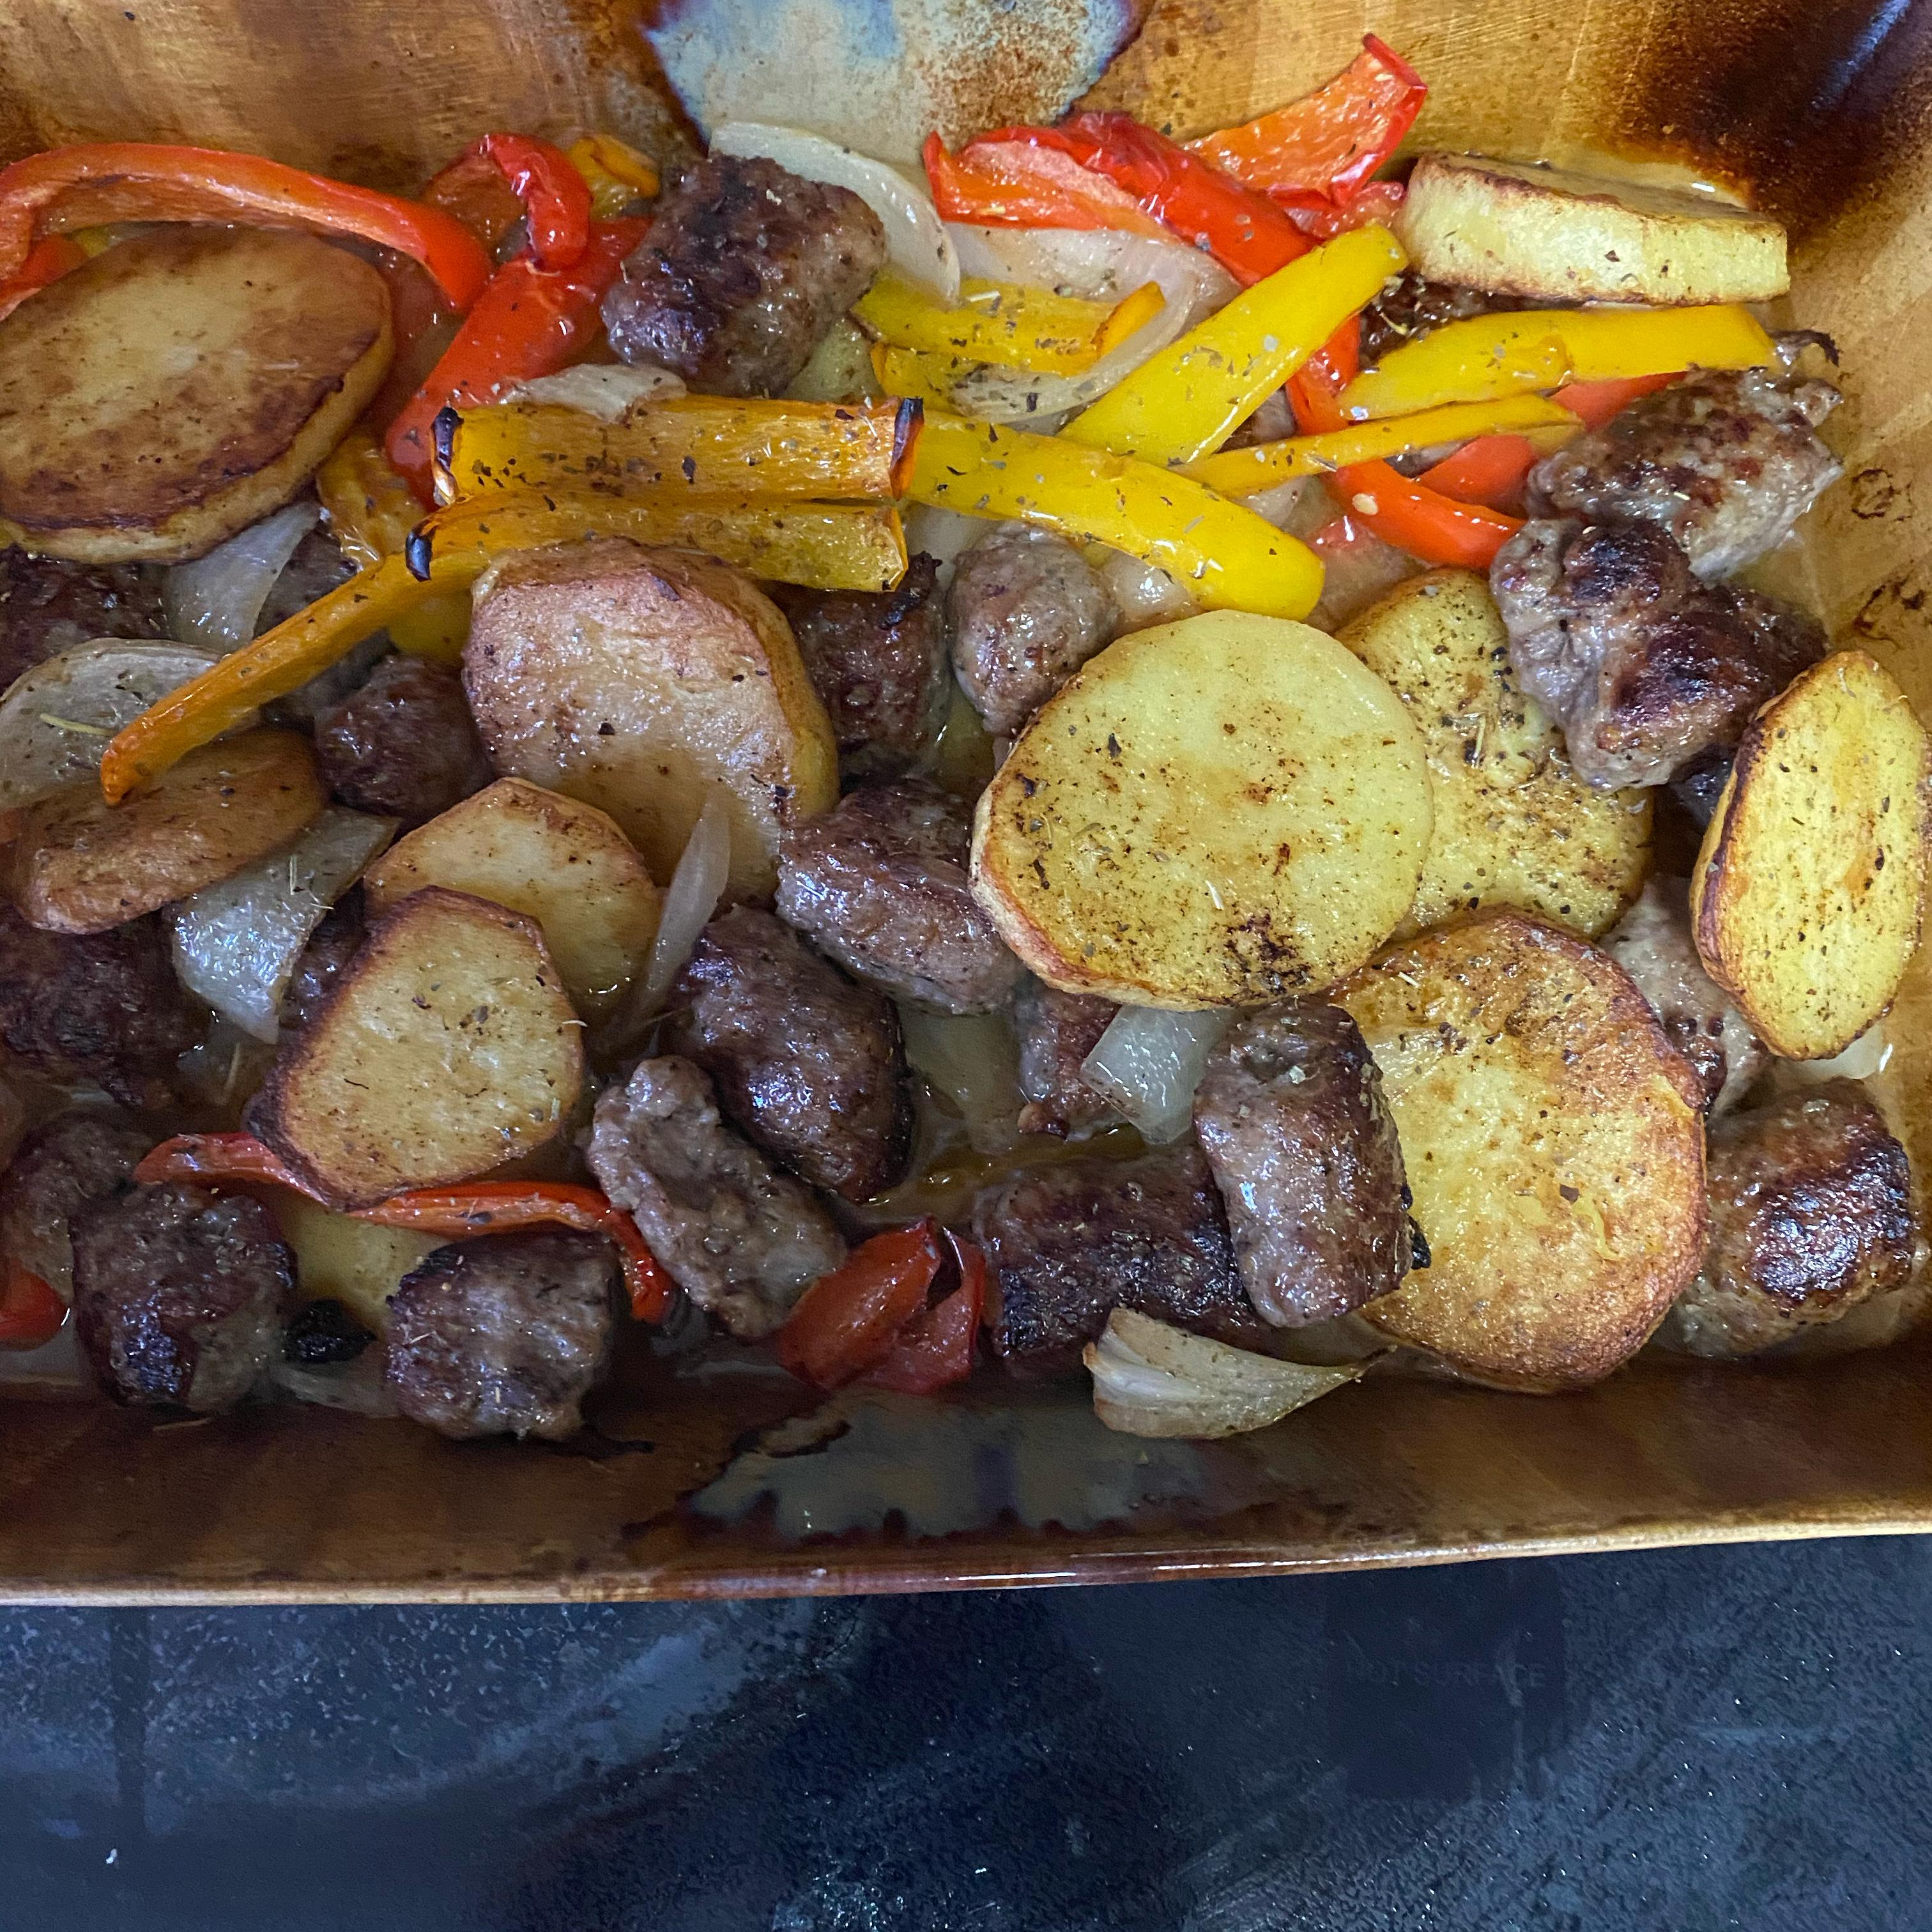 Sausage, Peppers, Onions, and Potato Bake